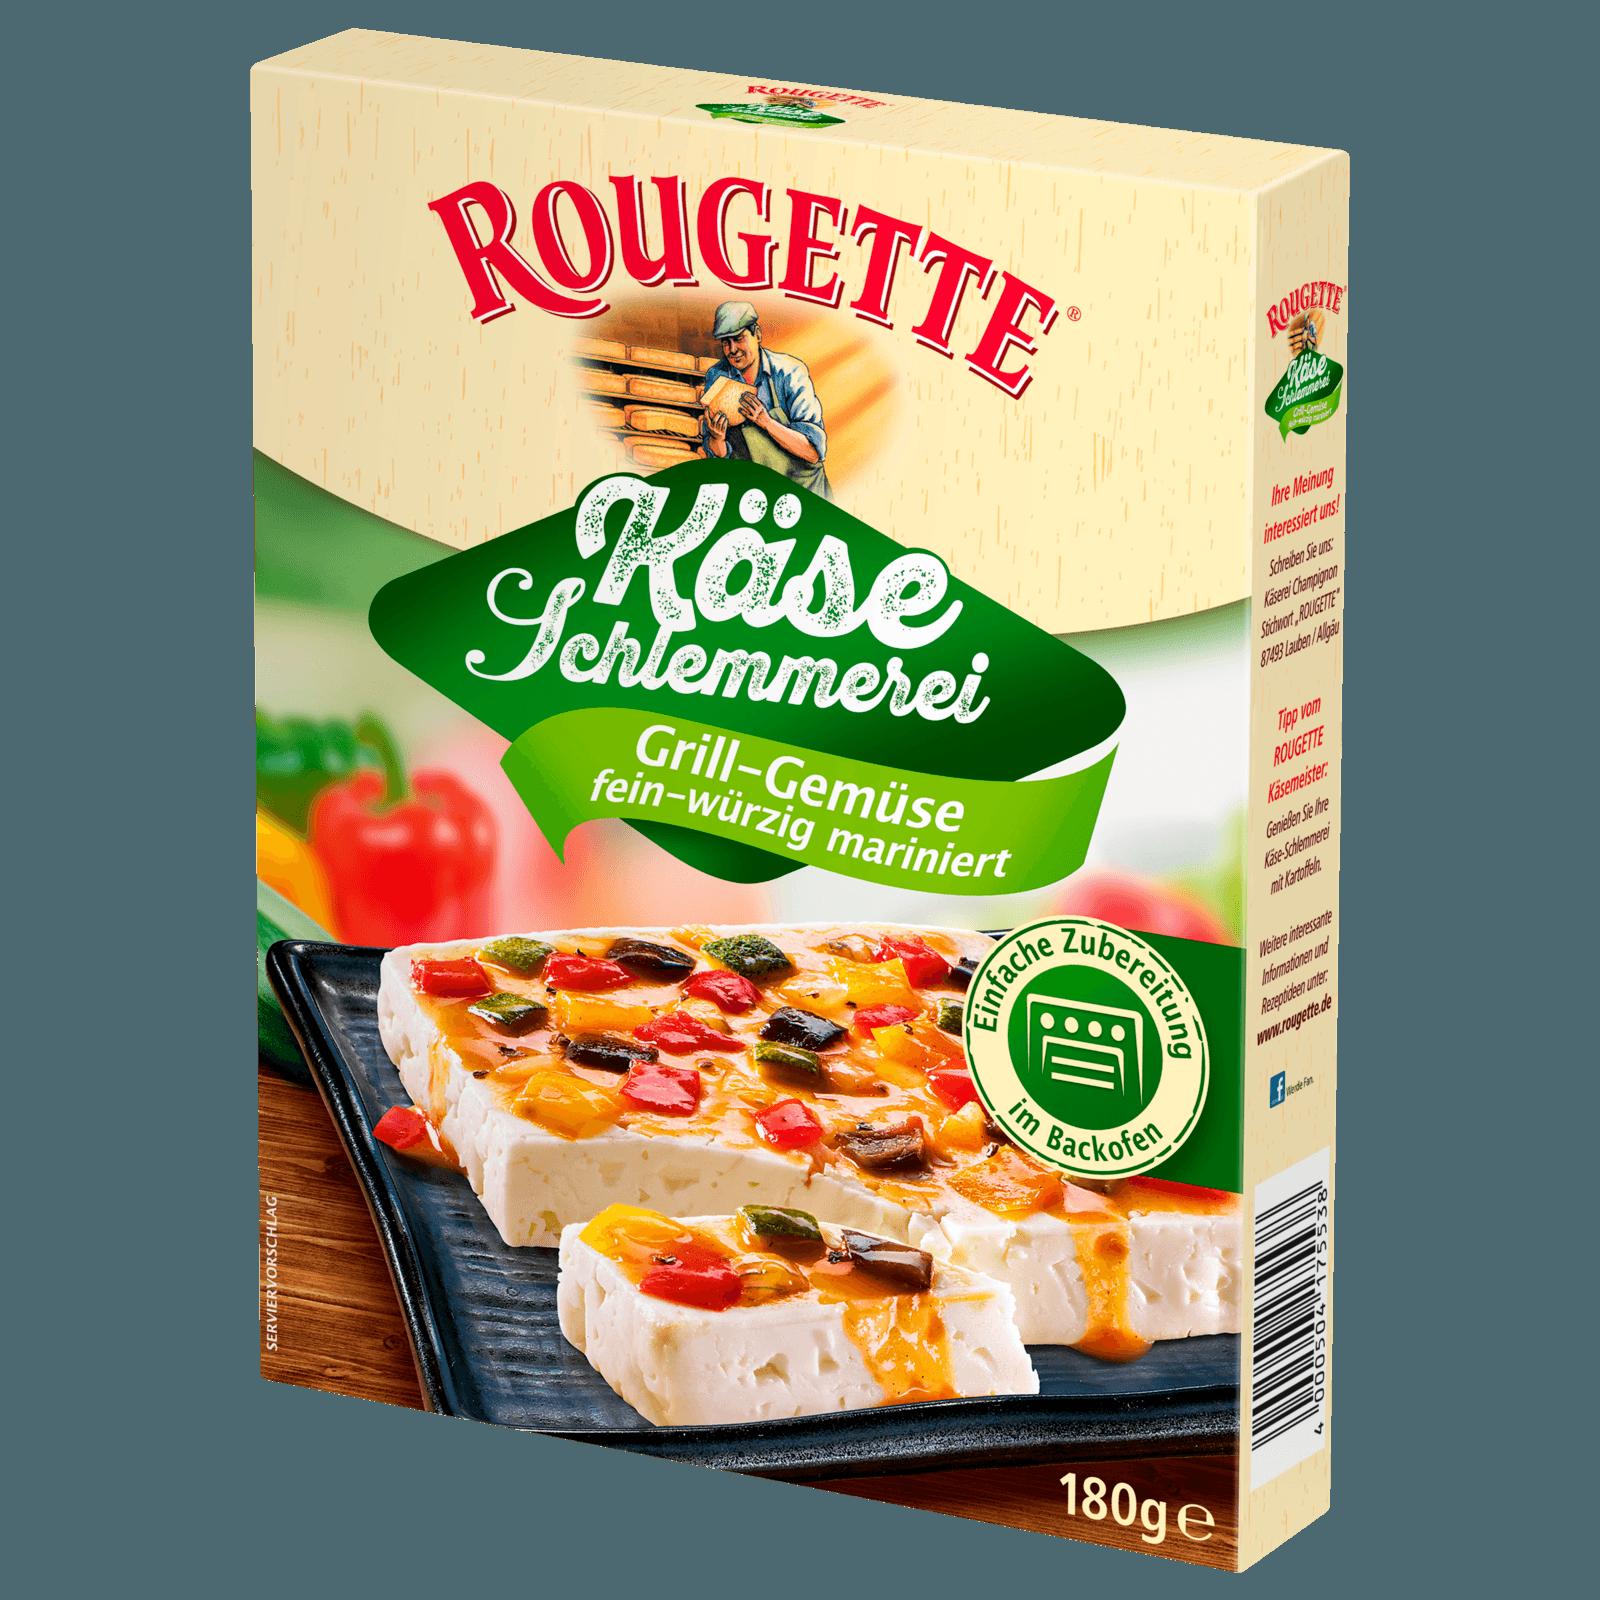 Rougette Käse-Schlemmerei Grill-Gemüse fein-würzig 180g